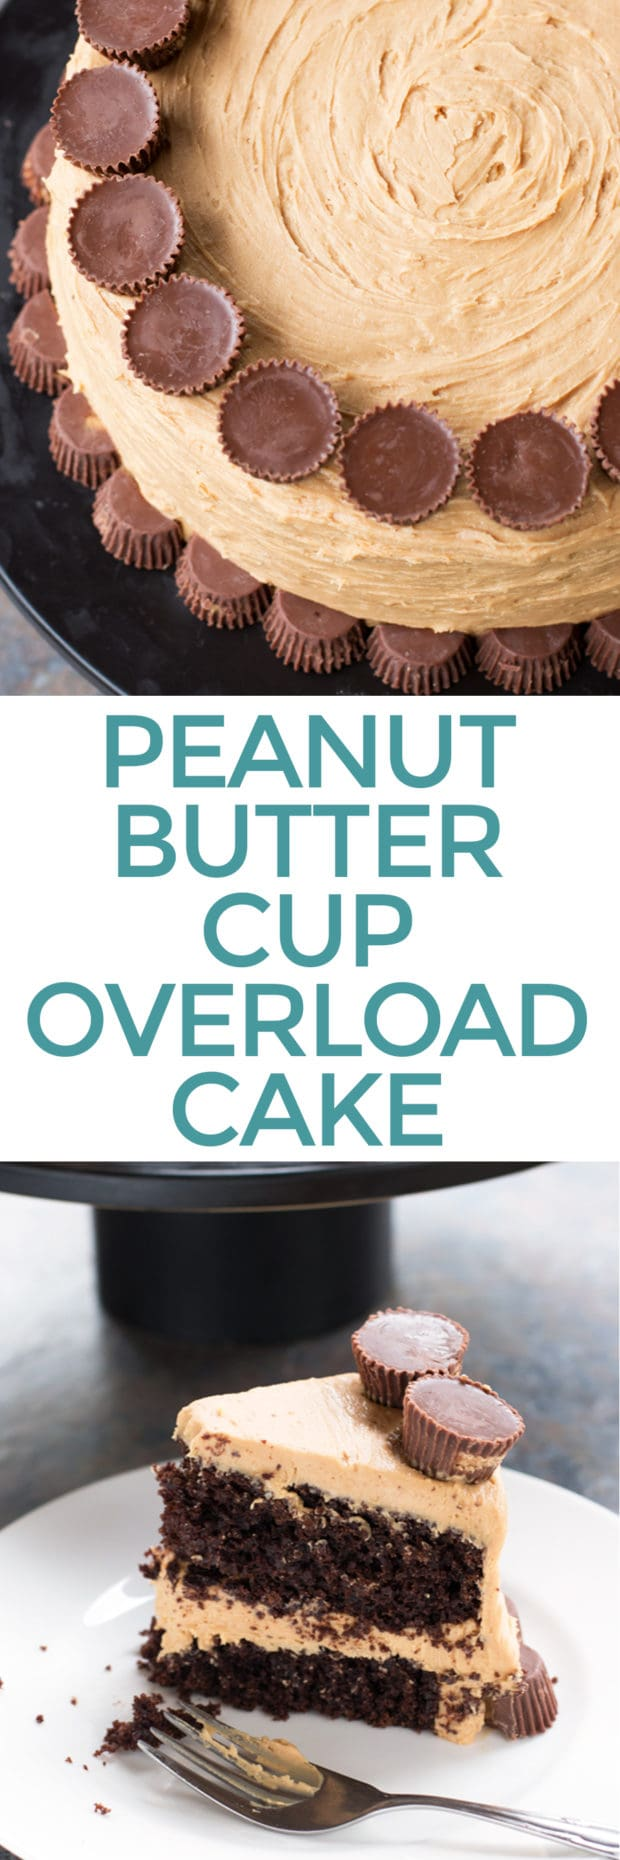 Peanut Butter Cup Overload Cake | cakenknife.com